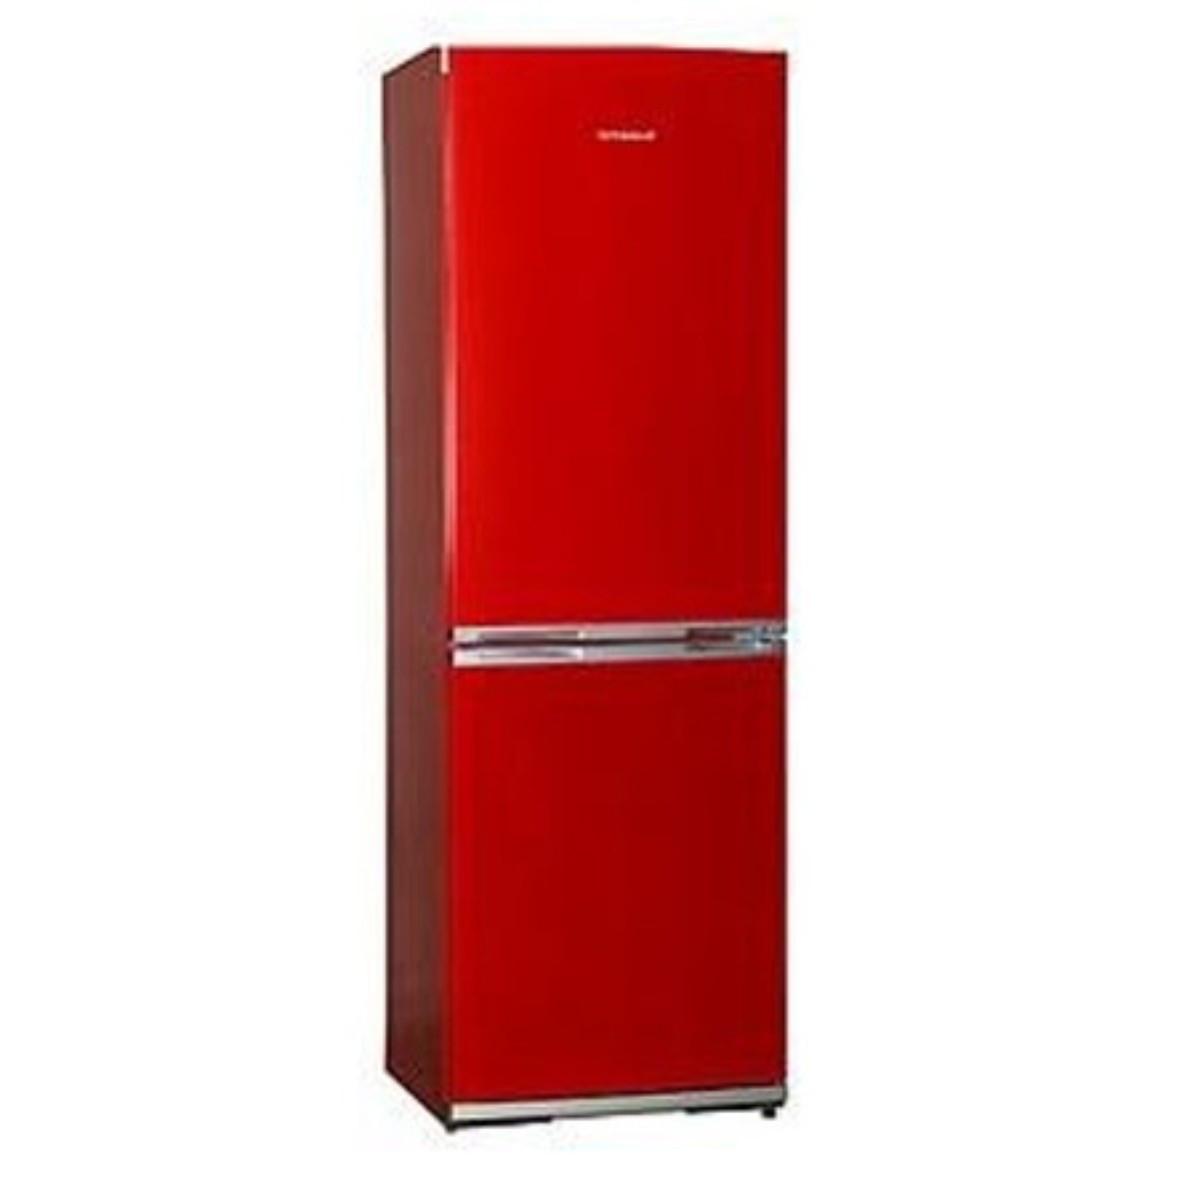 Двухкамерный холодильник Snaige RF31SM-S1RA21